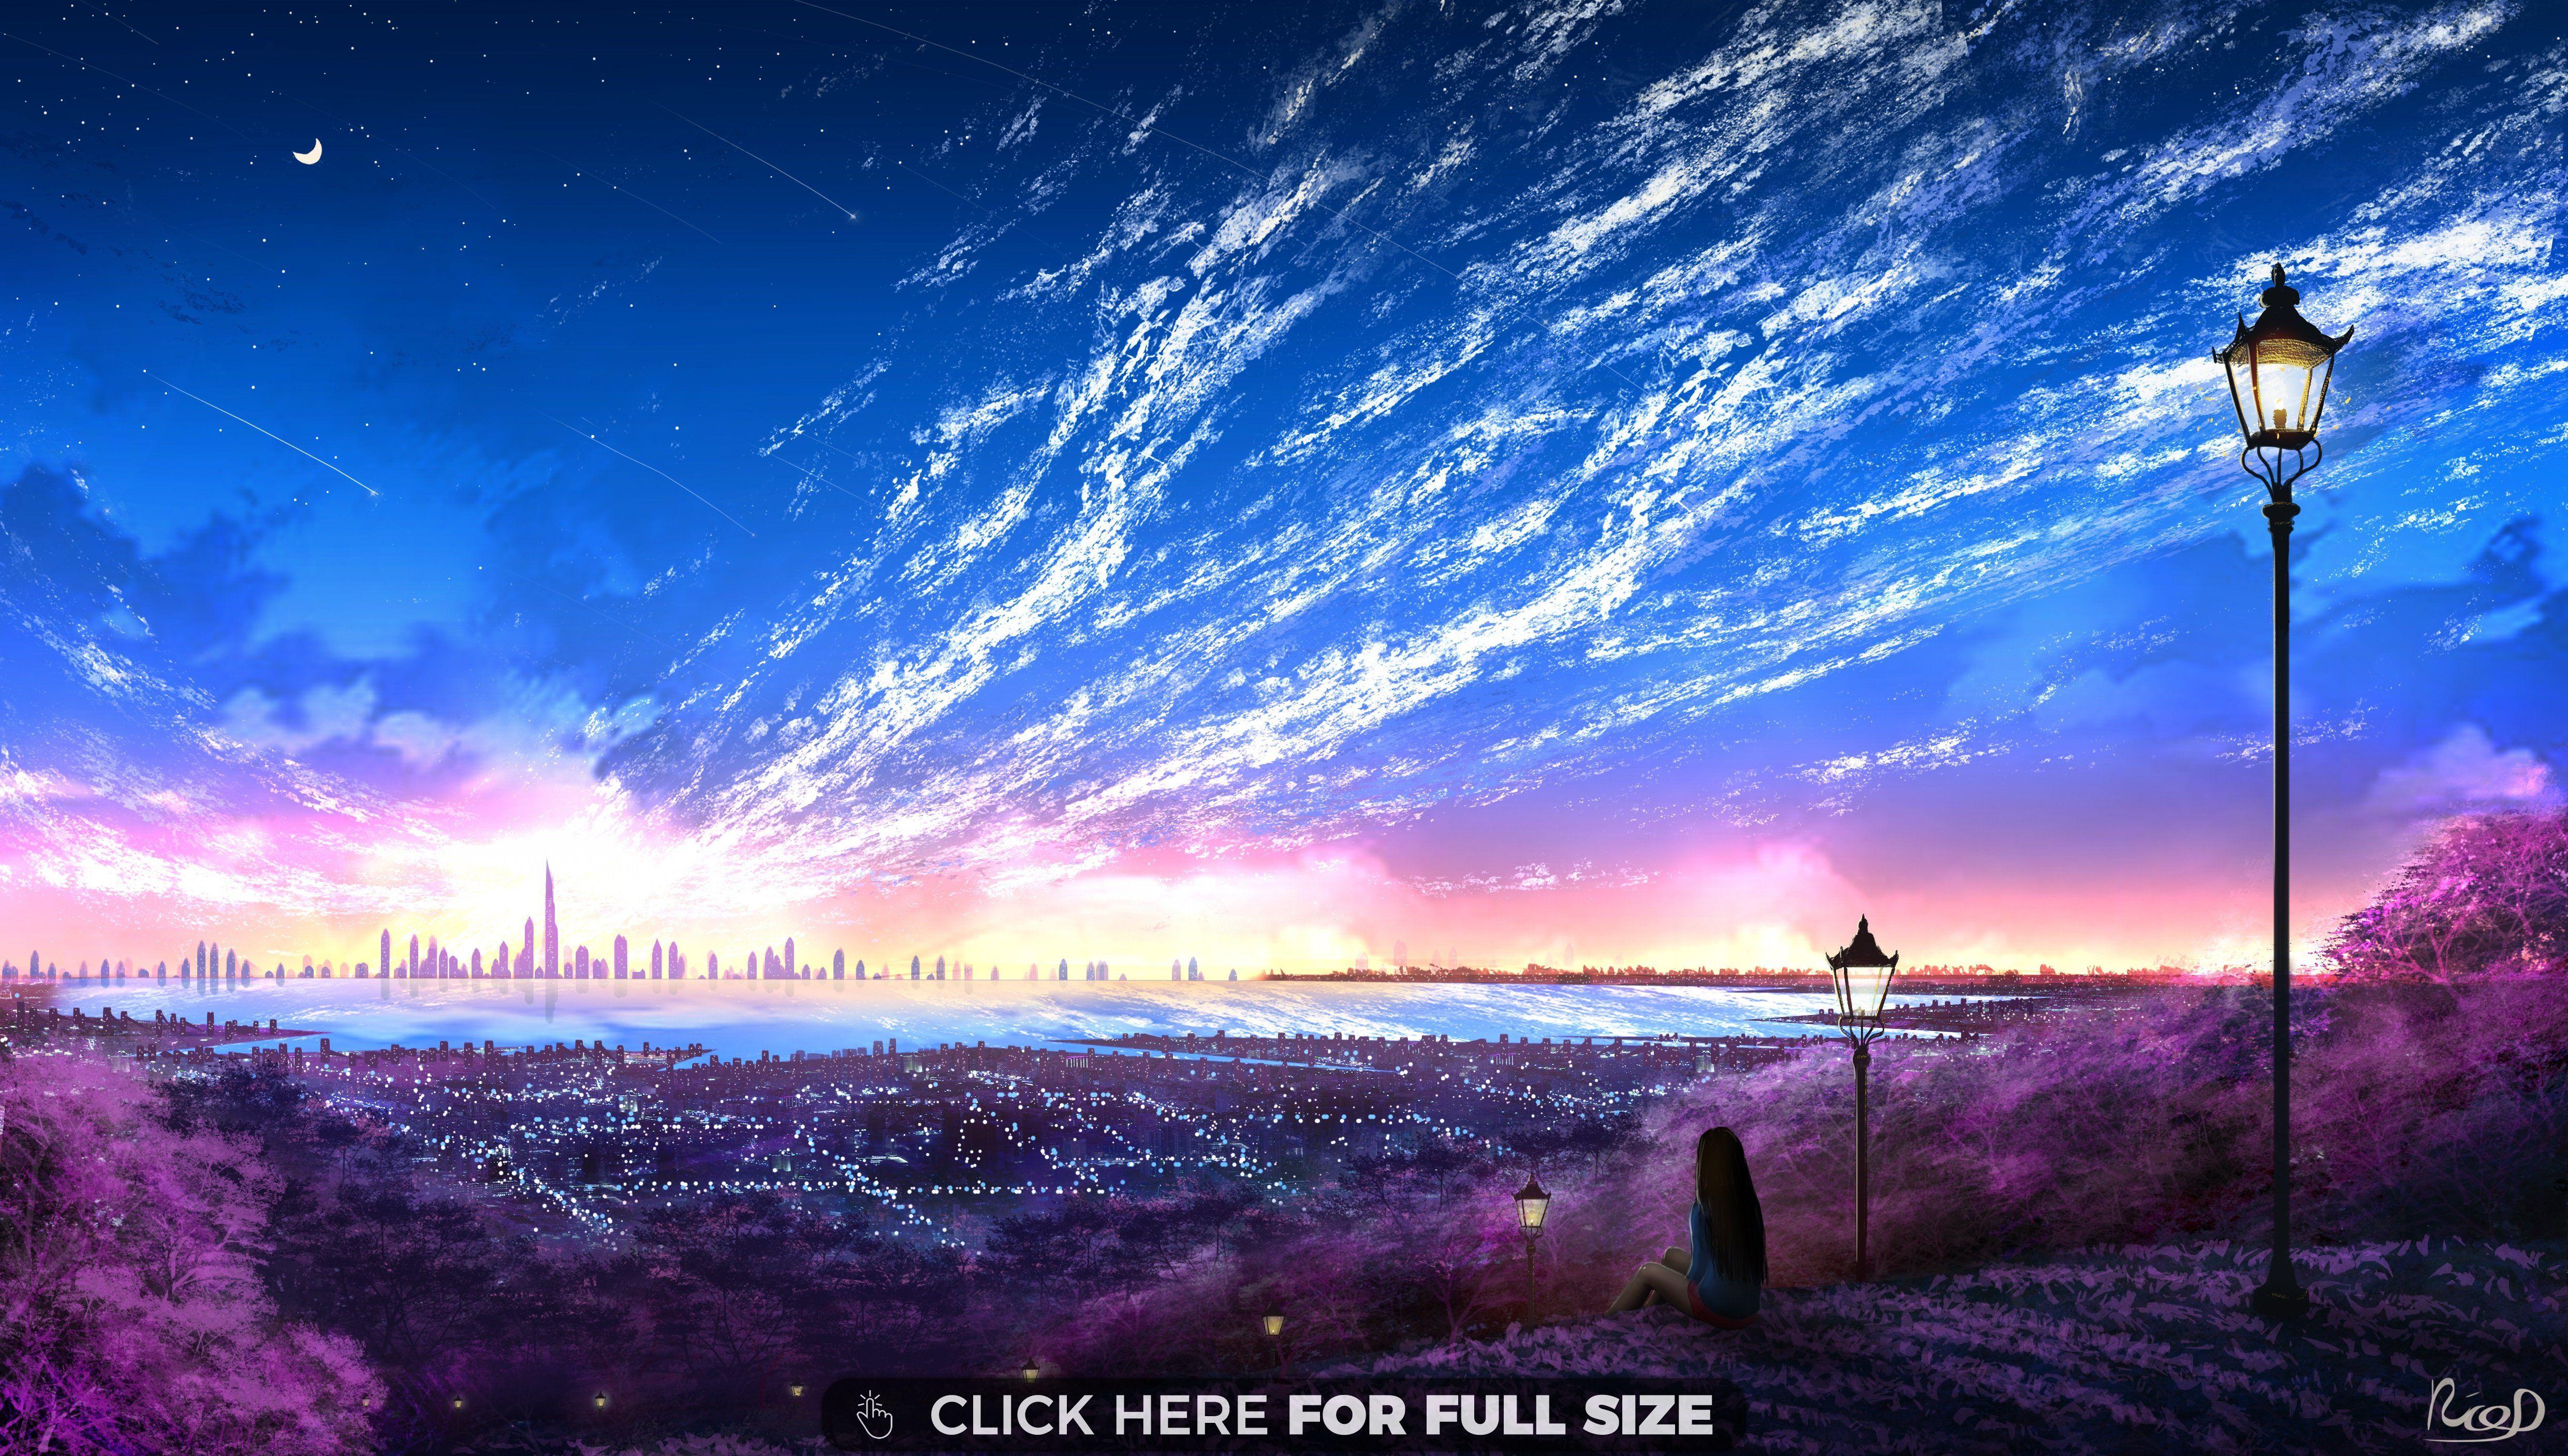 Feather Clouds 4k Wallpaper Scenery Wallpaper Hd Anime Wallpapers Anime Scenery Wallpaper